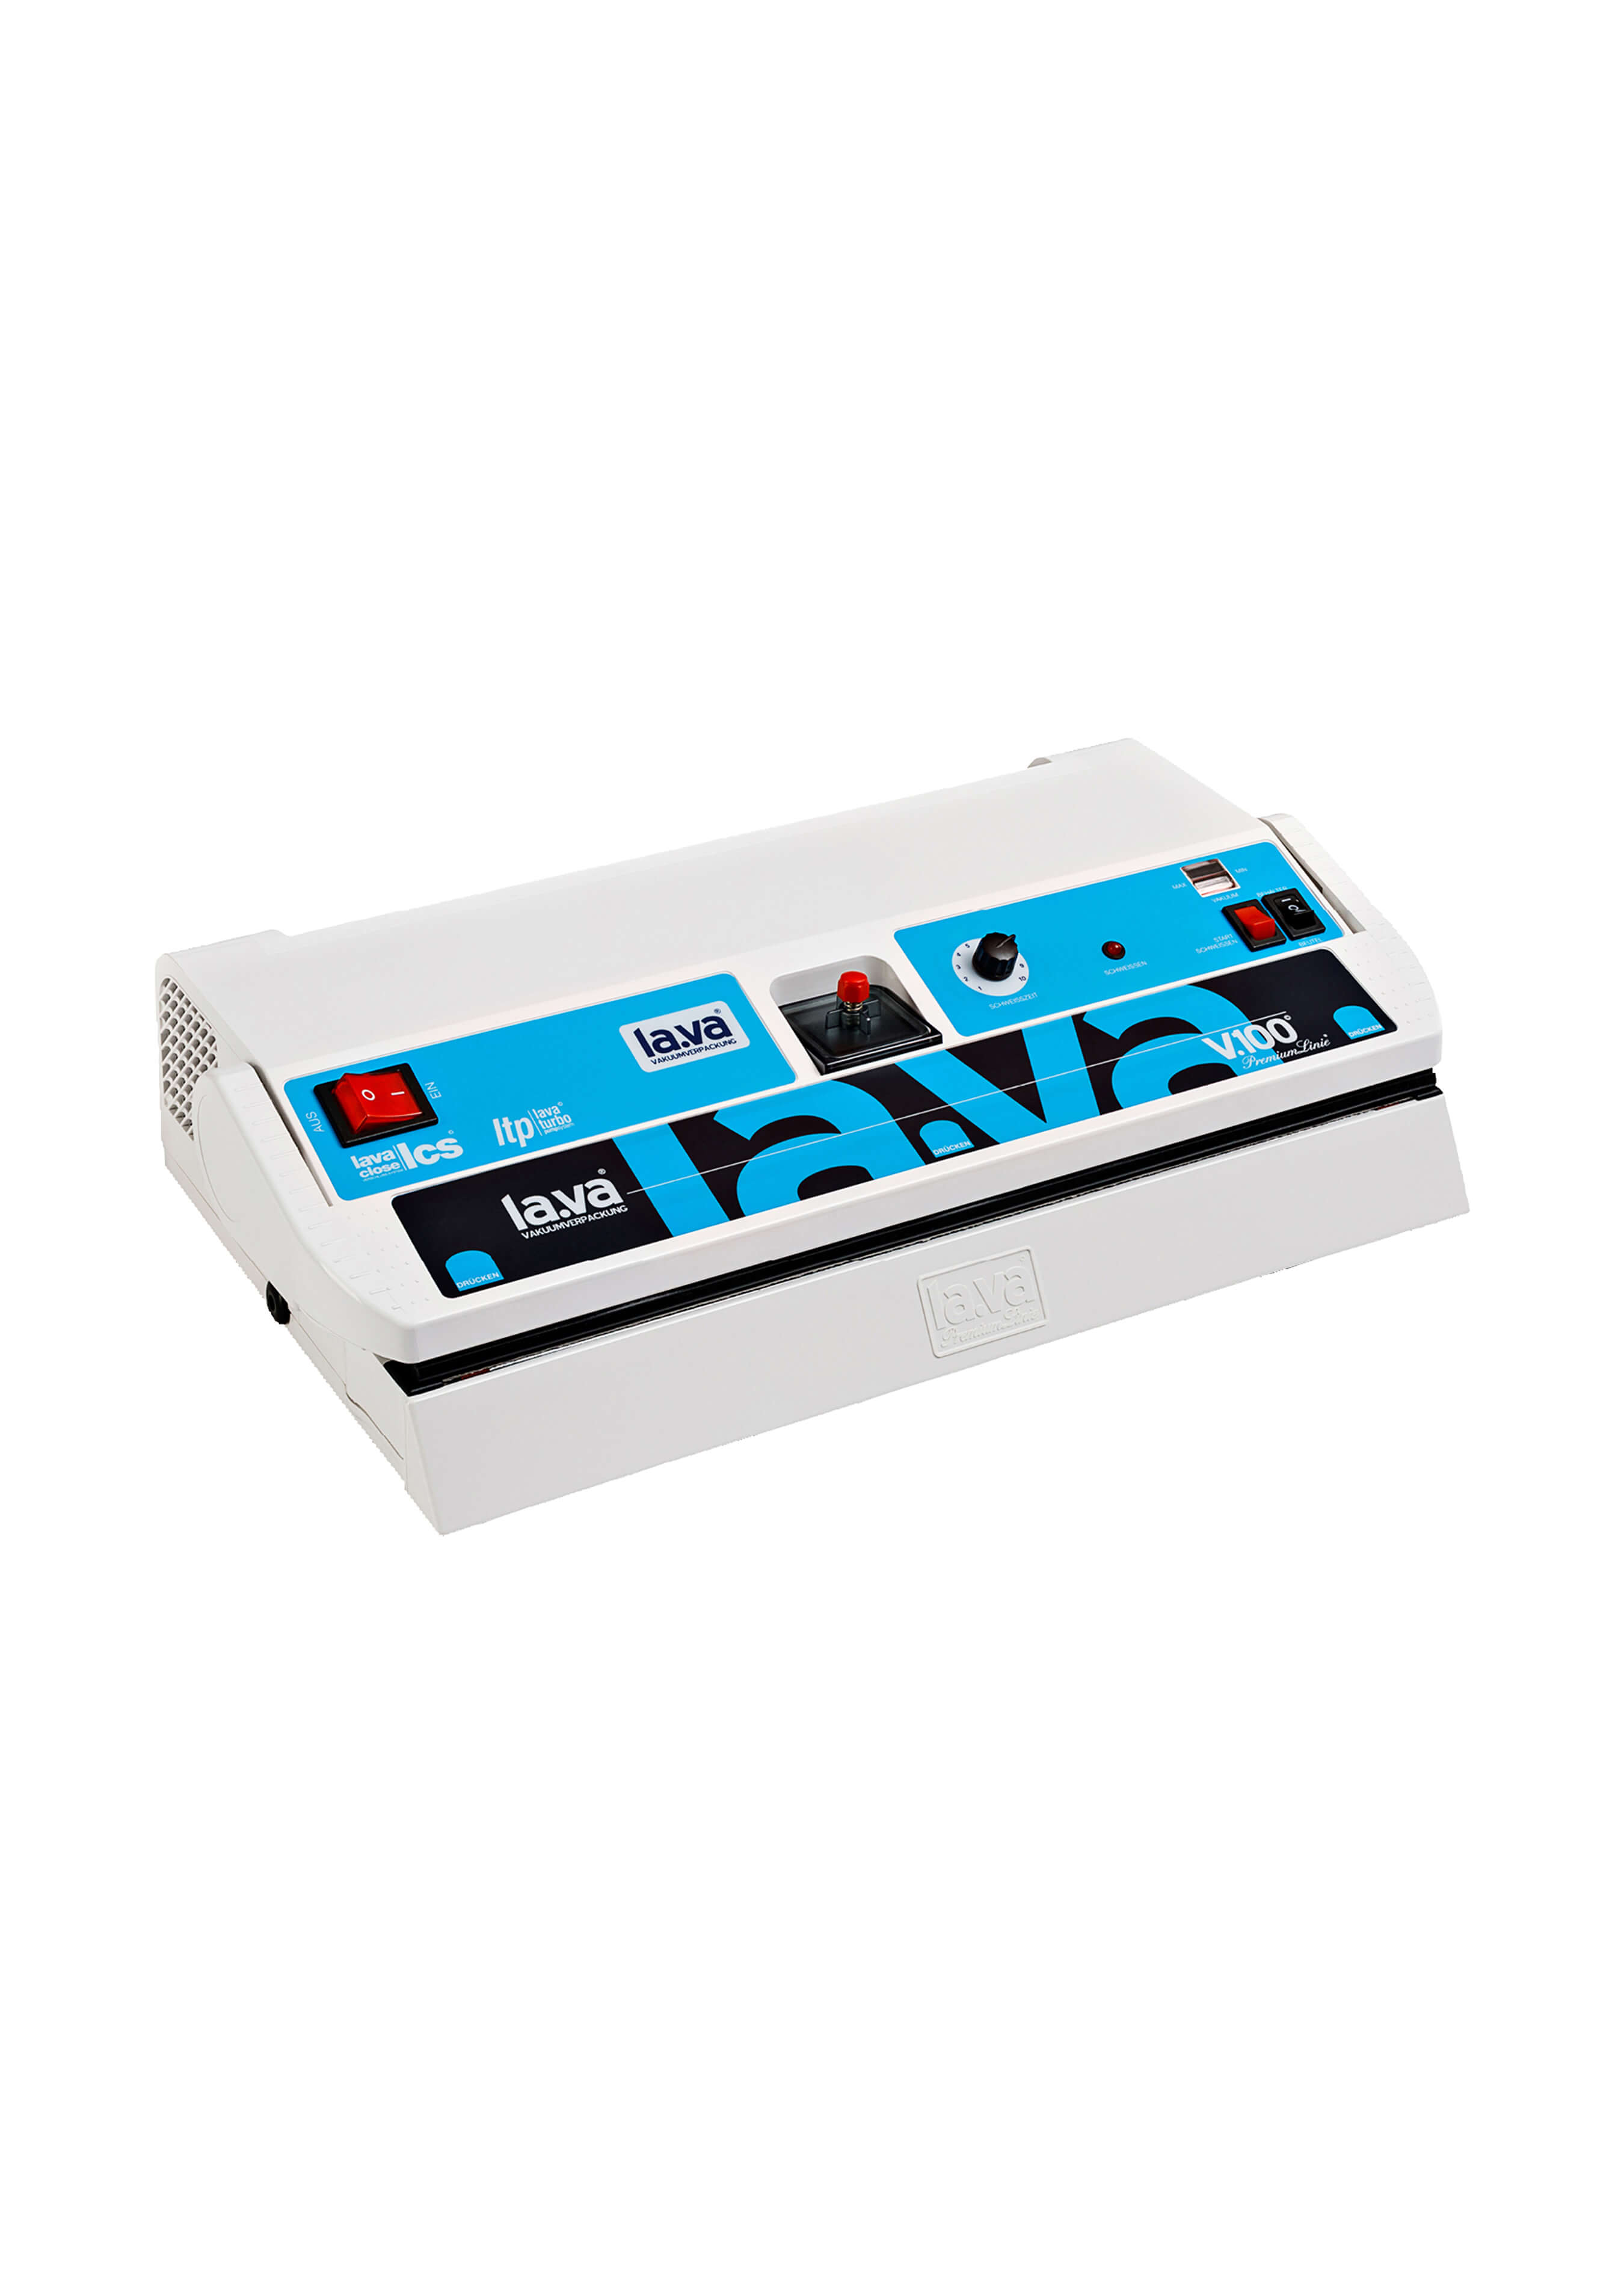 Lava Vakuumiergerät V100 Premium L2194 0